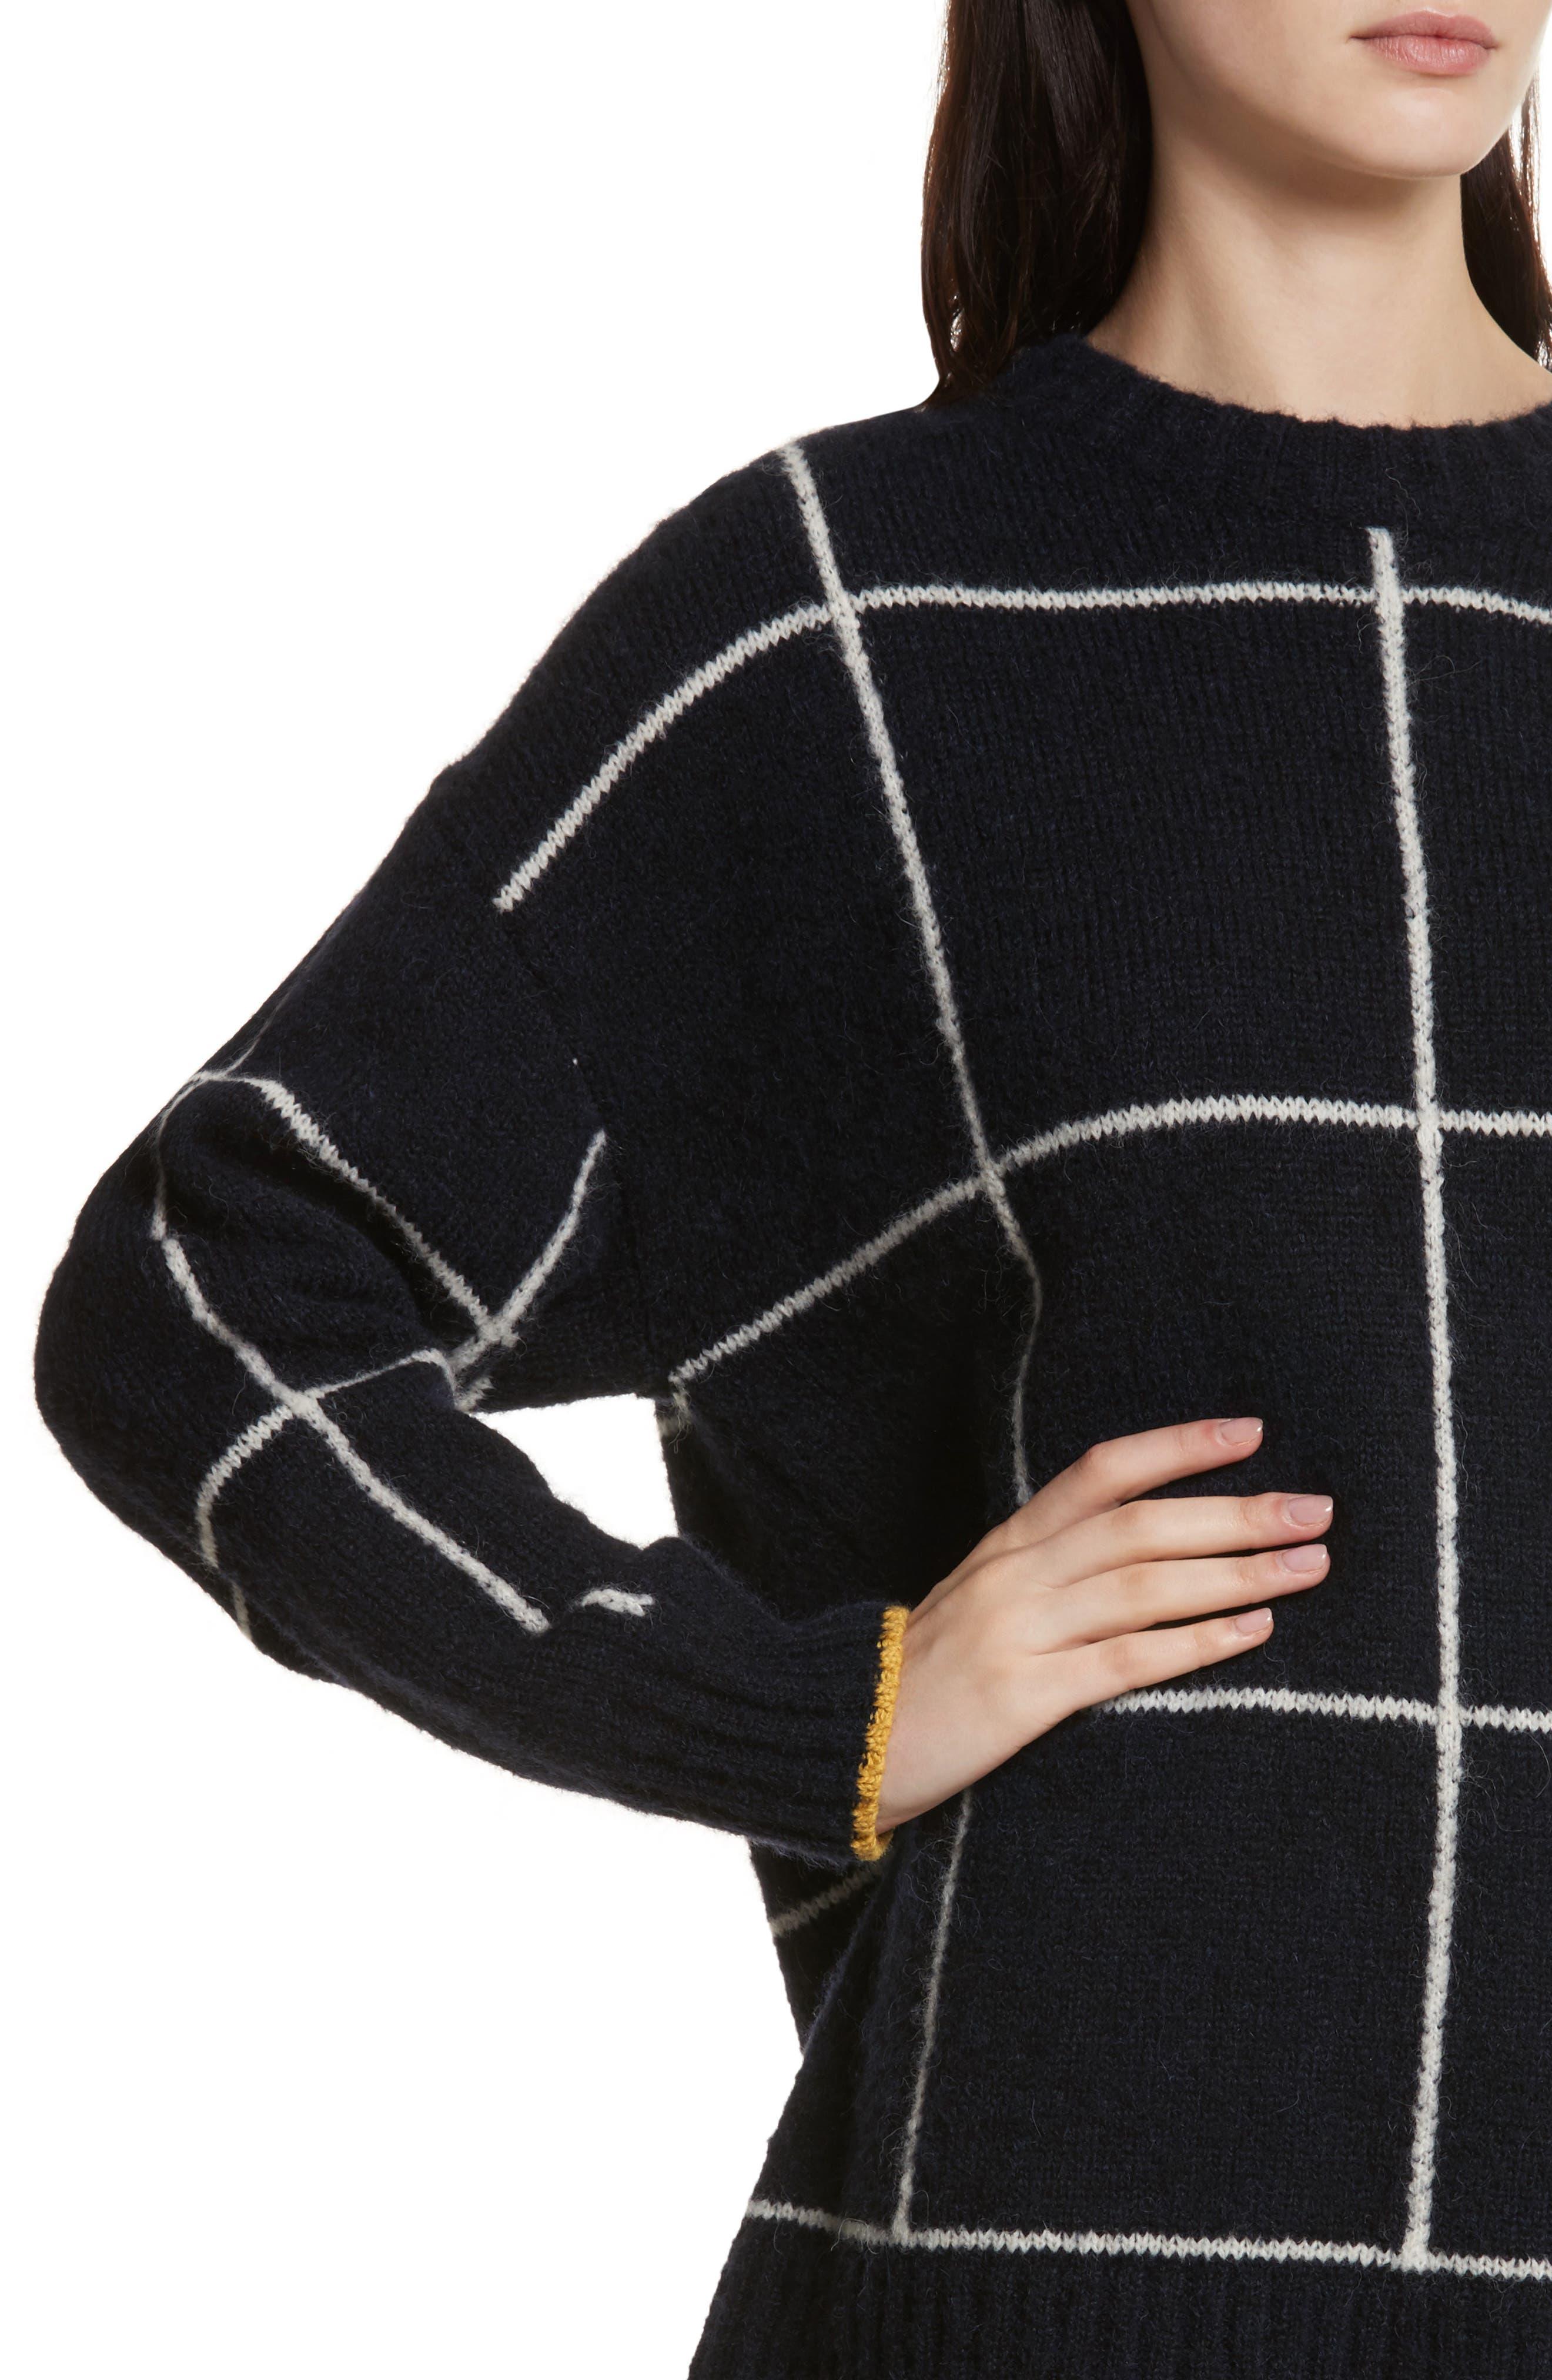 Fionn Windowpane Oversized Sweater,                             Alternate thumbnail 4, color,                             Navy/ Alabaster/ Pollen